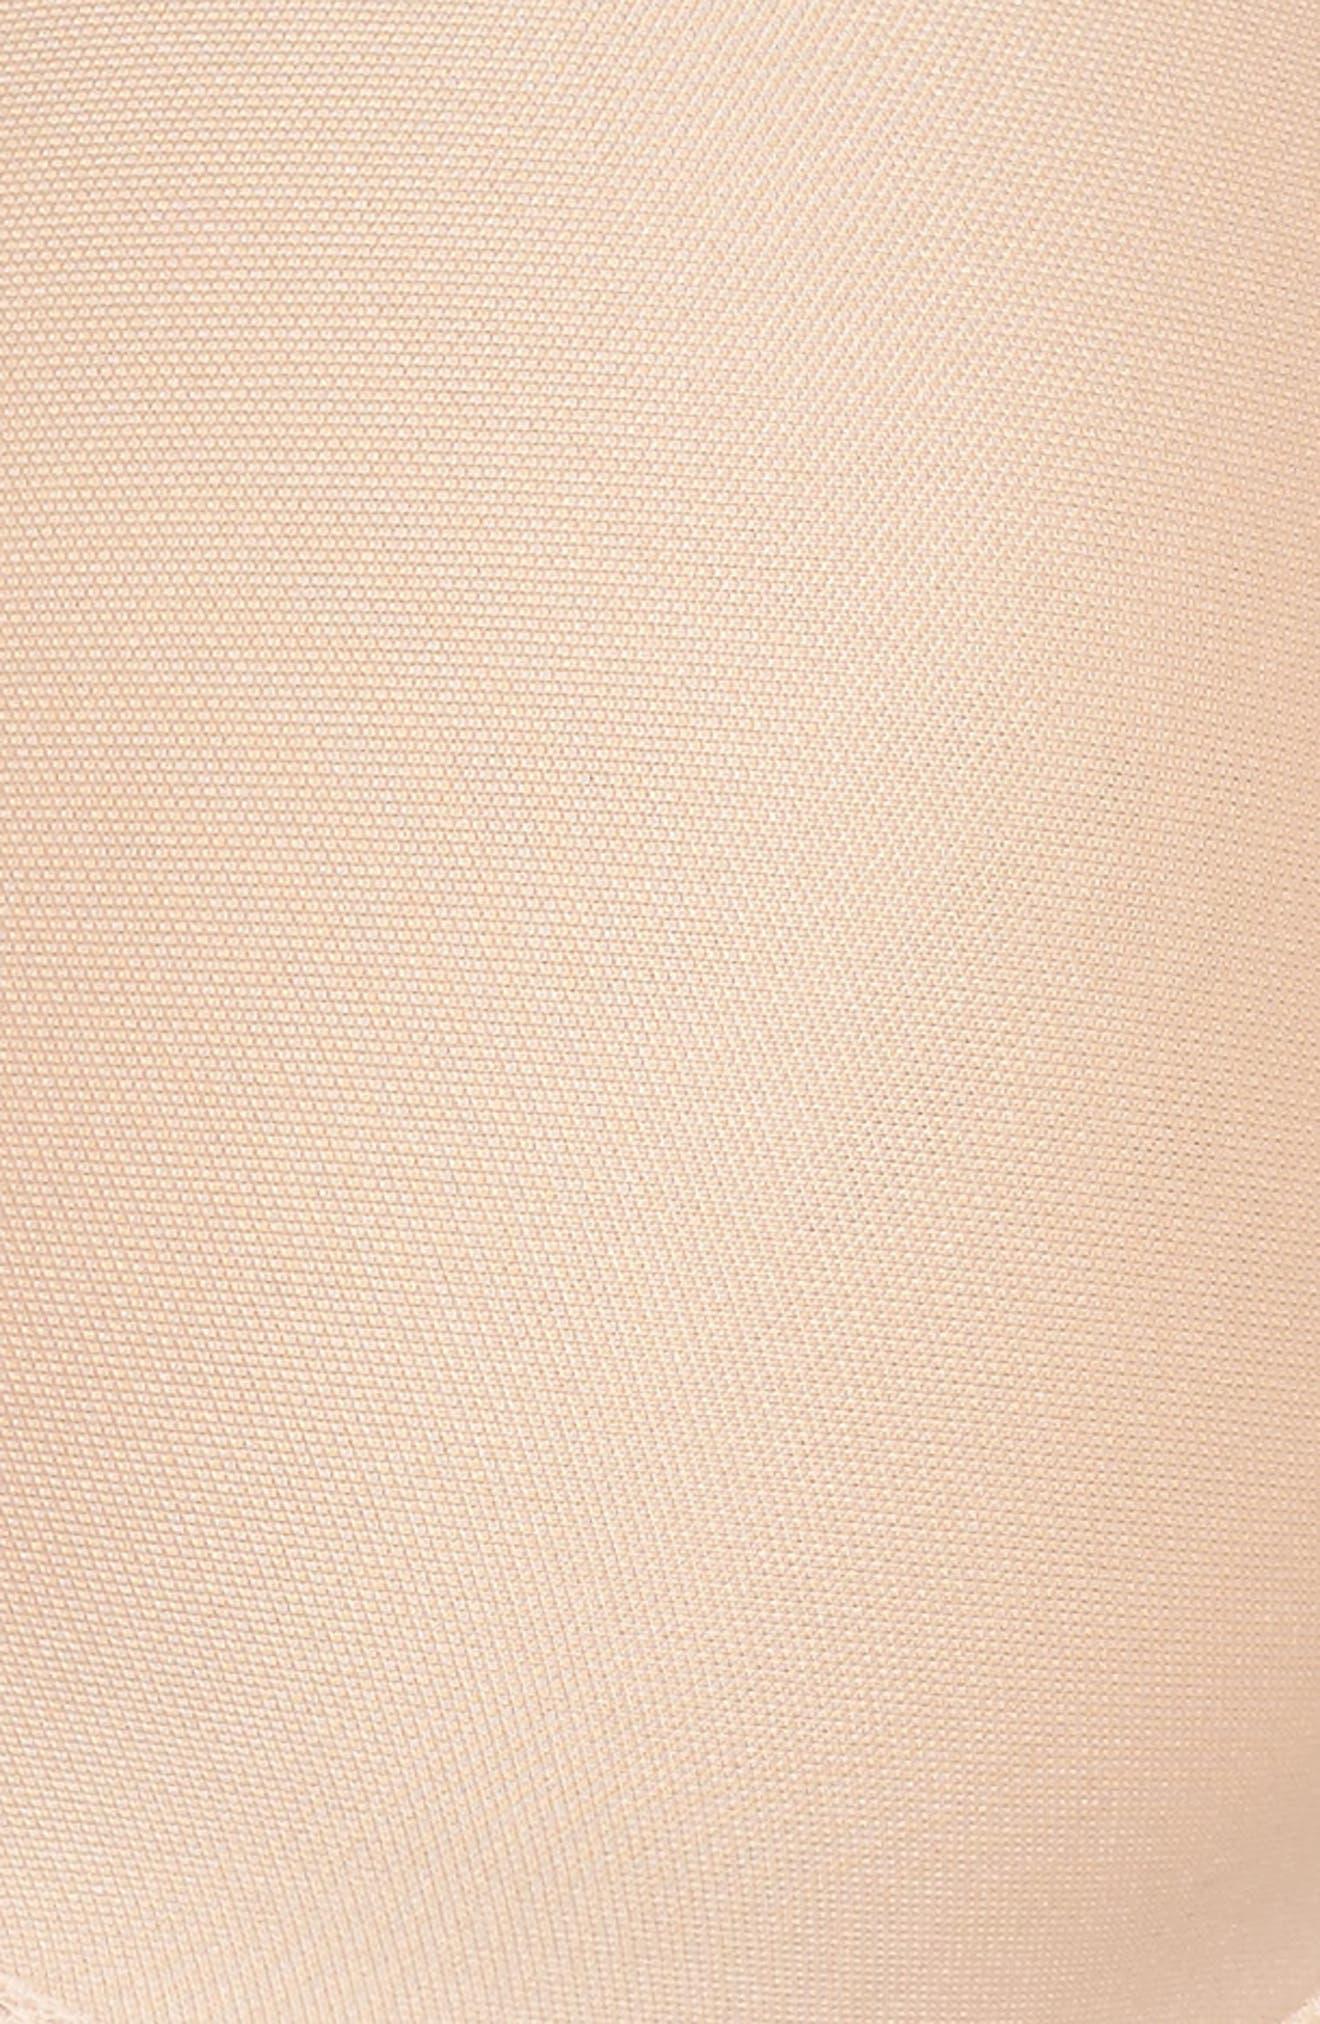 Modern Invisible Silicone-Free Strapless Underwire Bra,                             Alternate thumbnail 8, color,                             Nude Blush